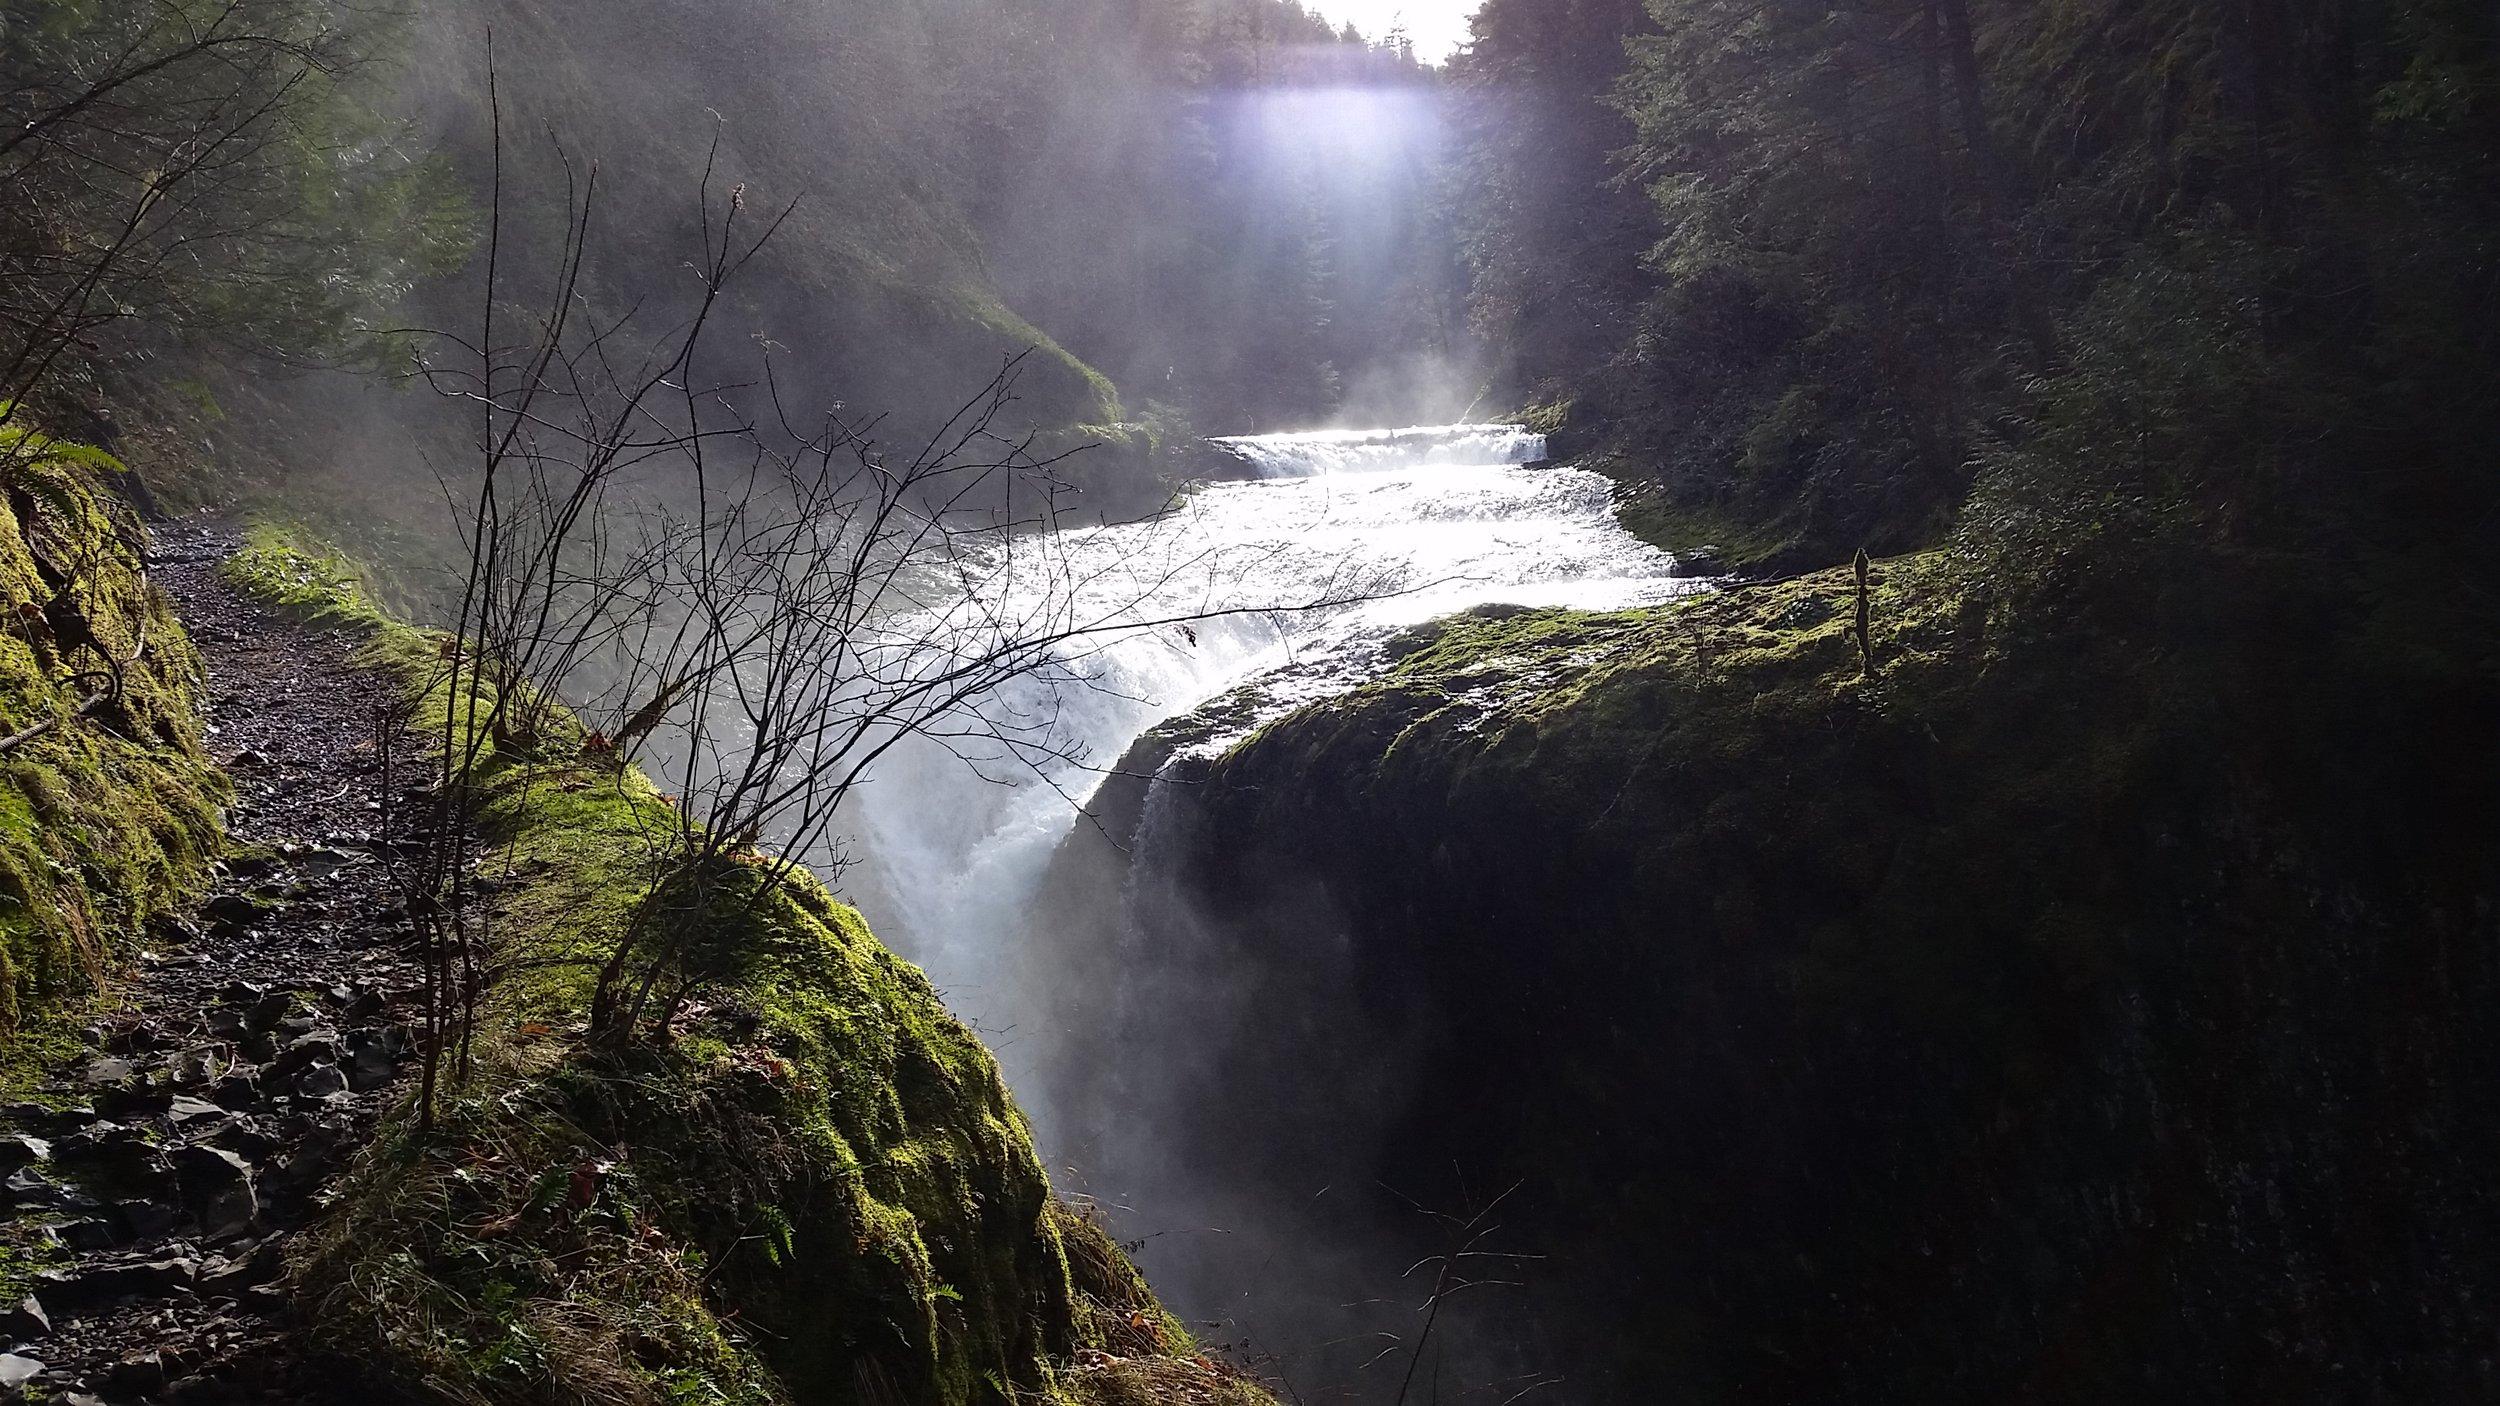 A magical trail beside a beautiful creek